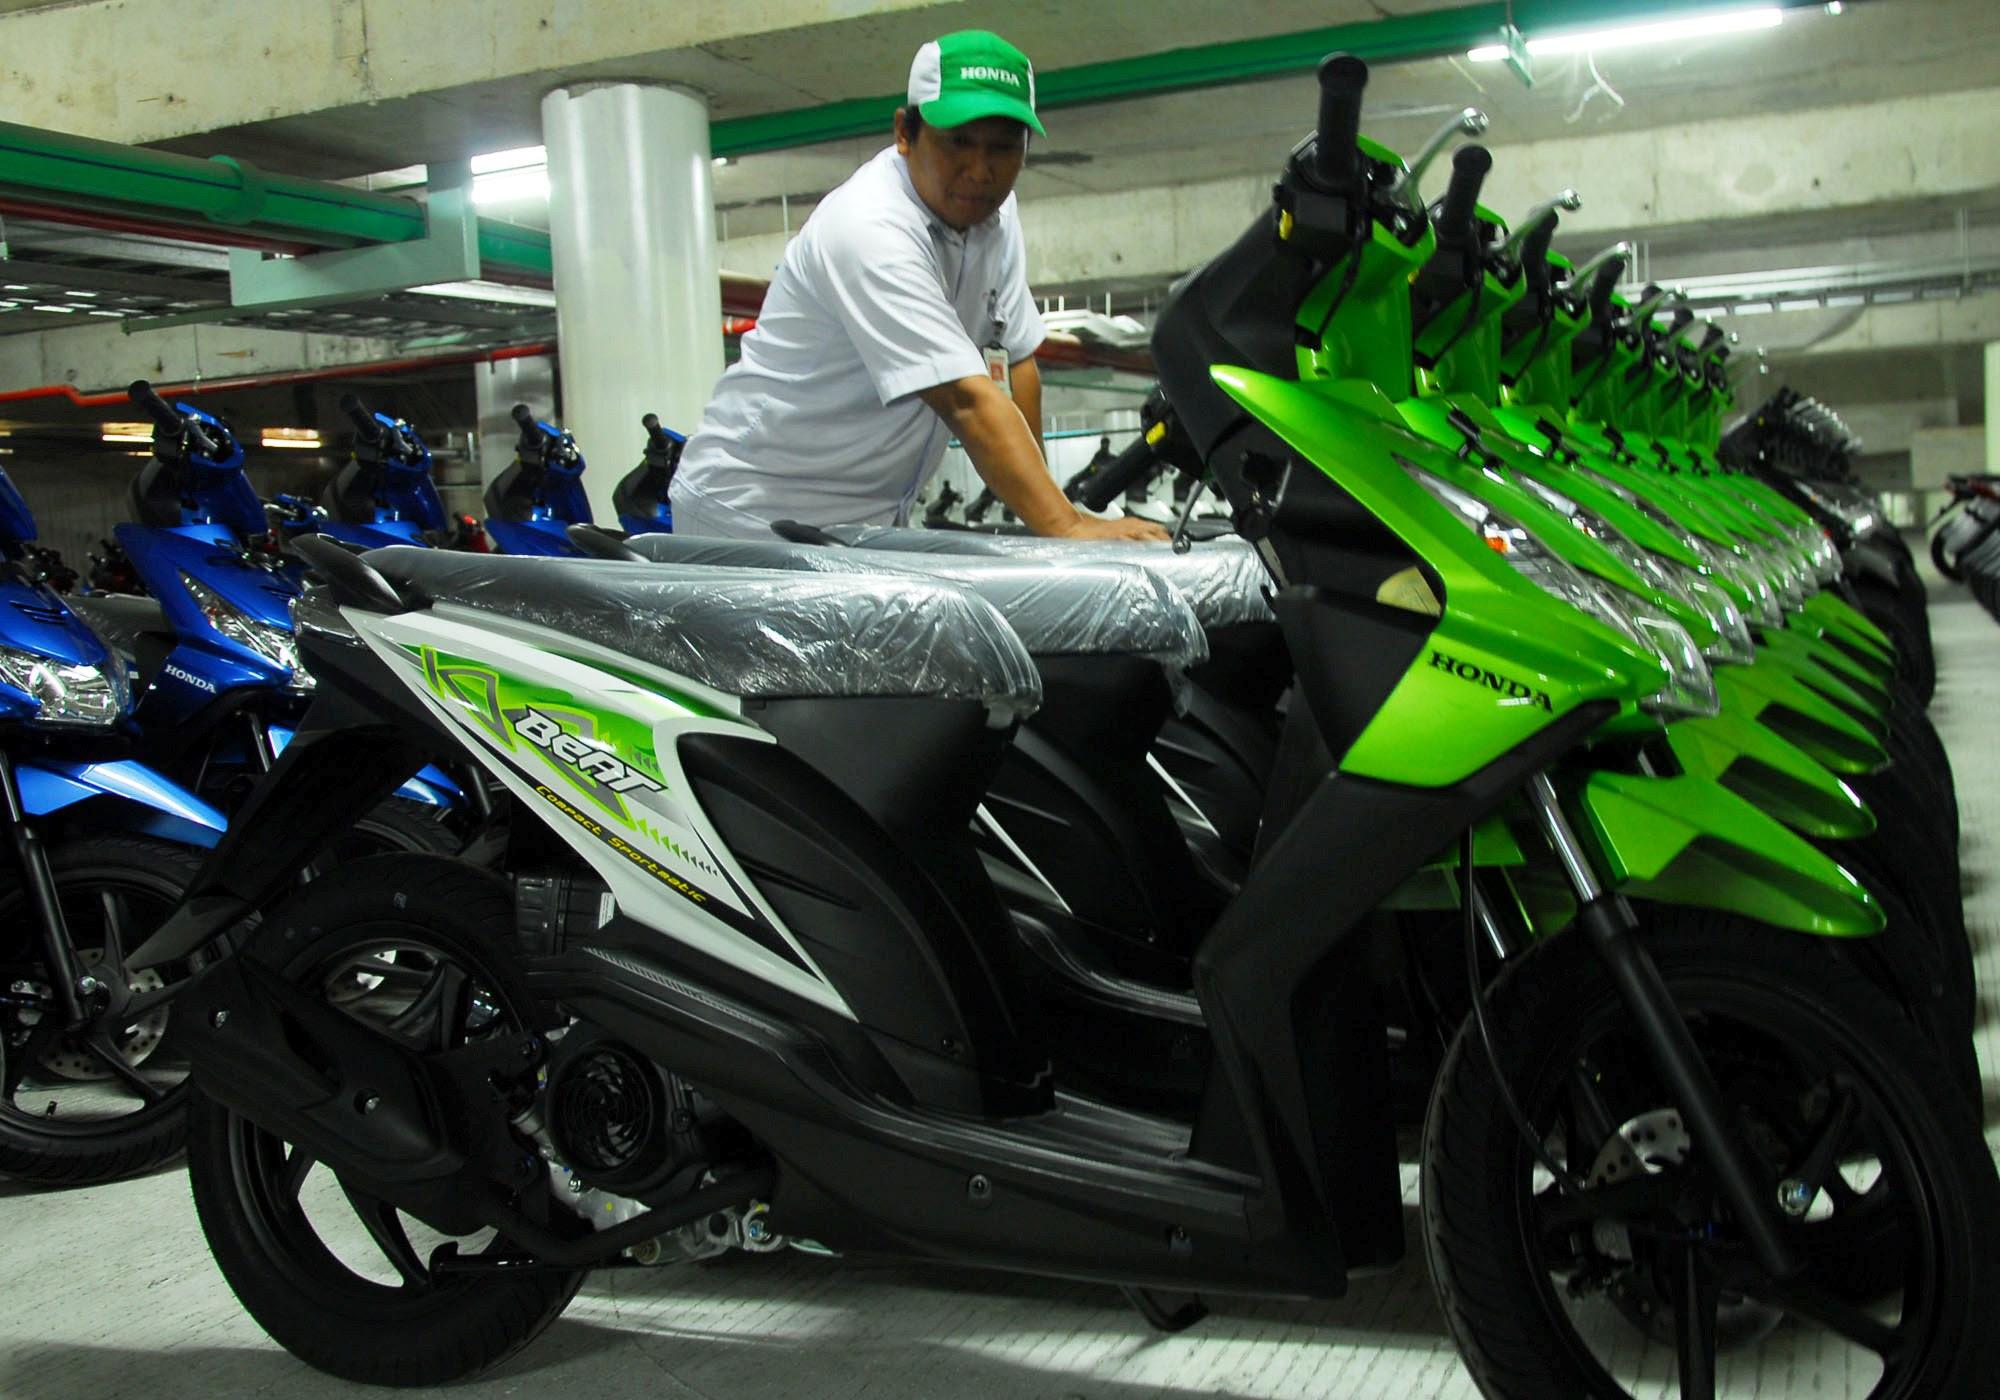 Kumpulan Foto Modifikasi Honda Beat Baru Terlengkap Gubuk Modifikasi